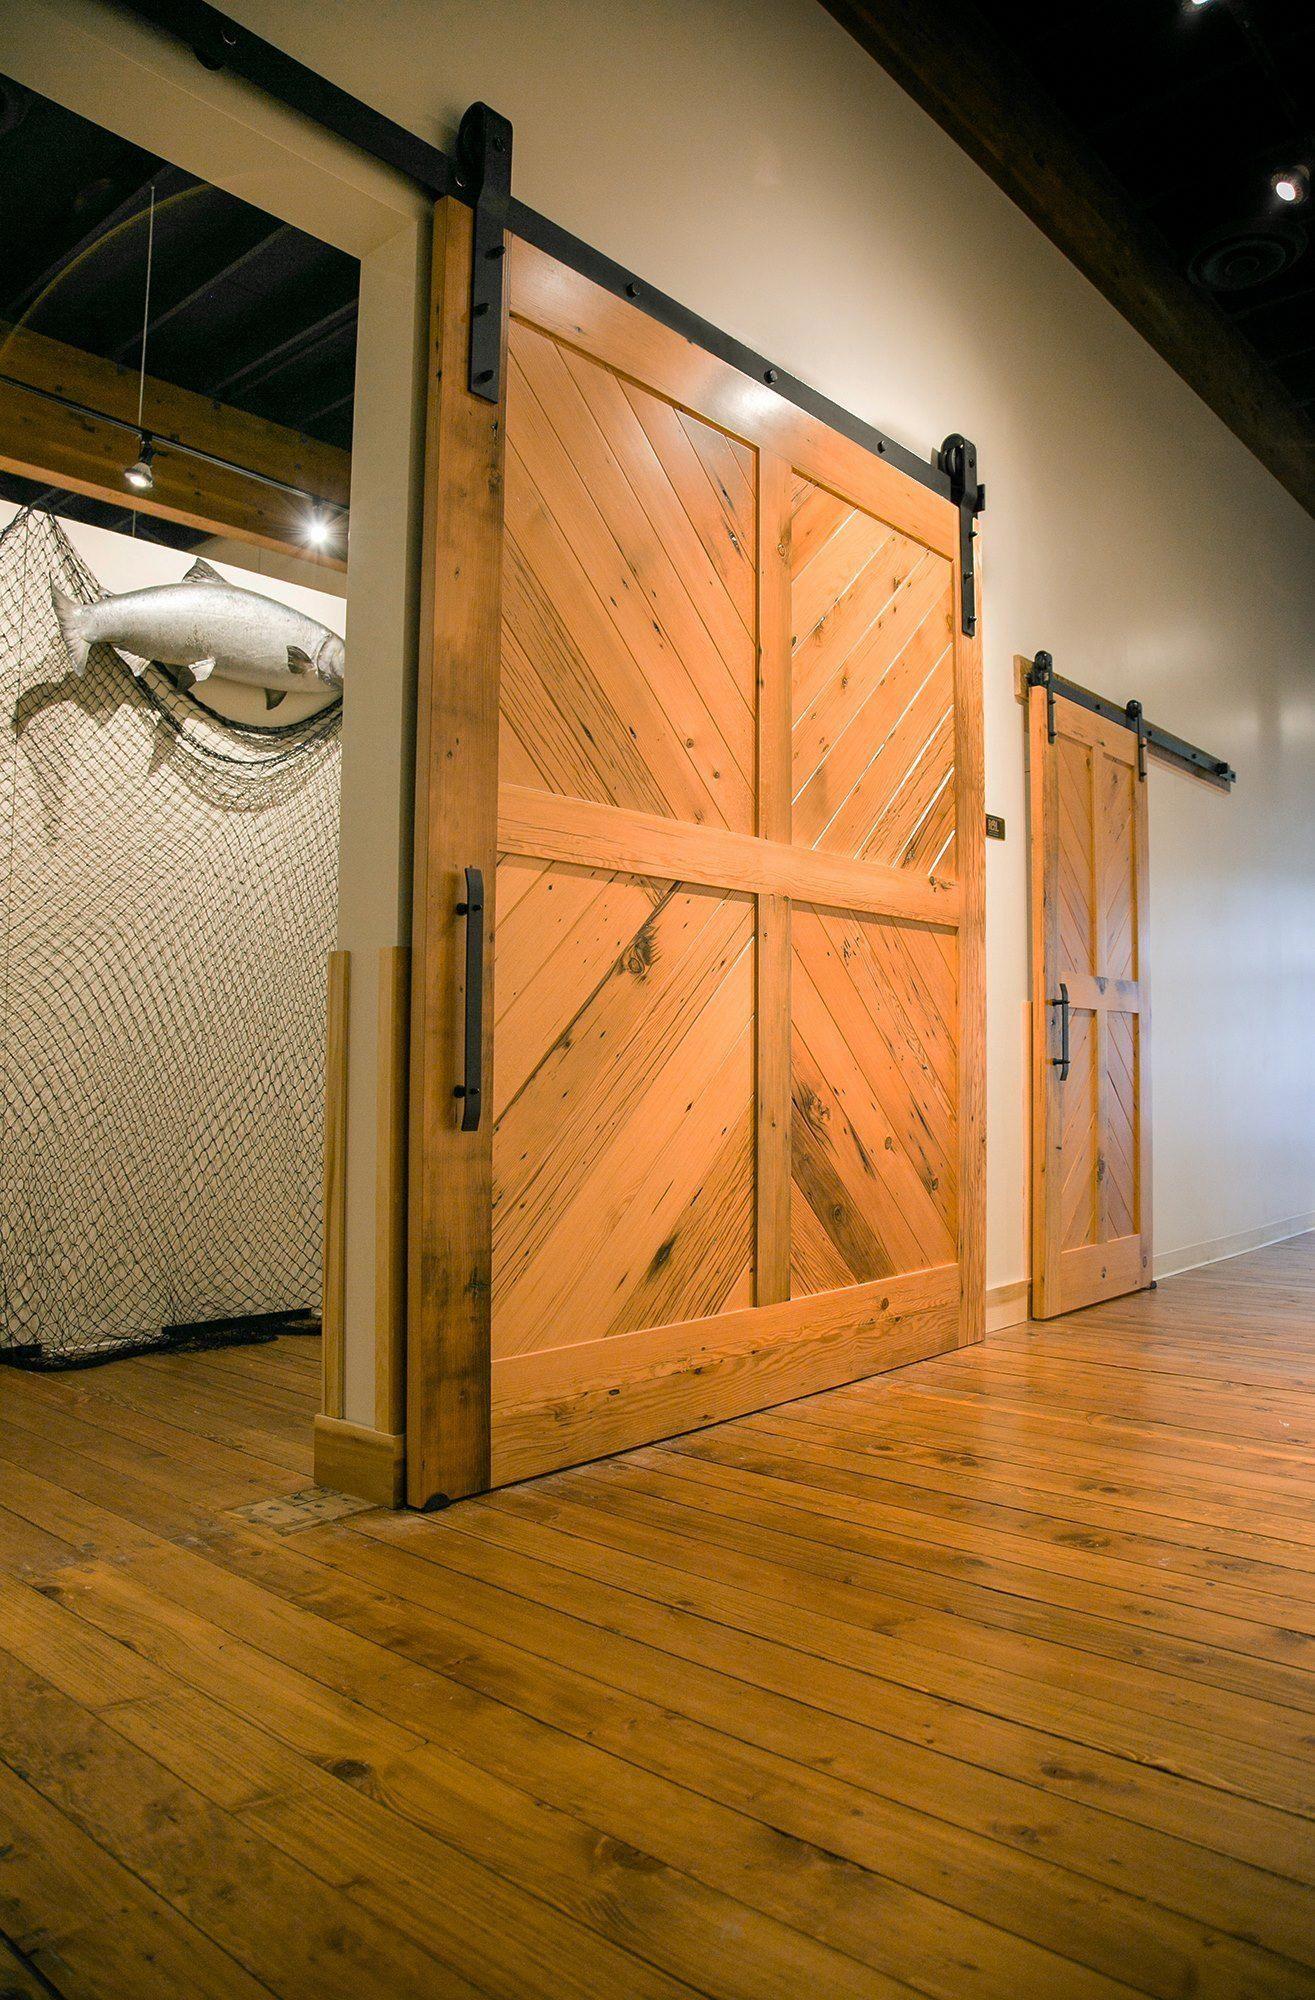 Barn Door Designs Inside Barn Door Hardware Masonite Interior Doors 20190215 Sliding Barn Door Hardware Barn Door Hardware Rustic Barn Door Hardware